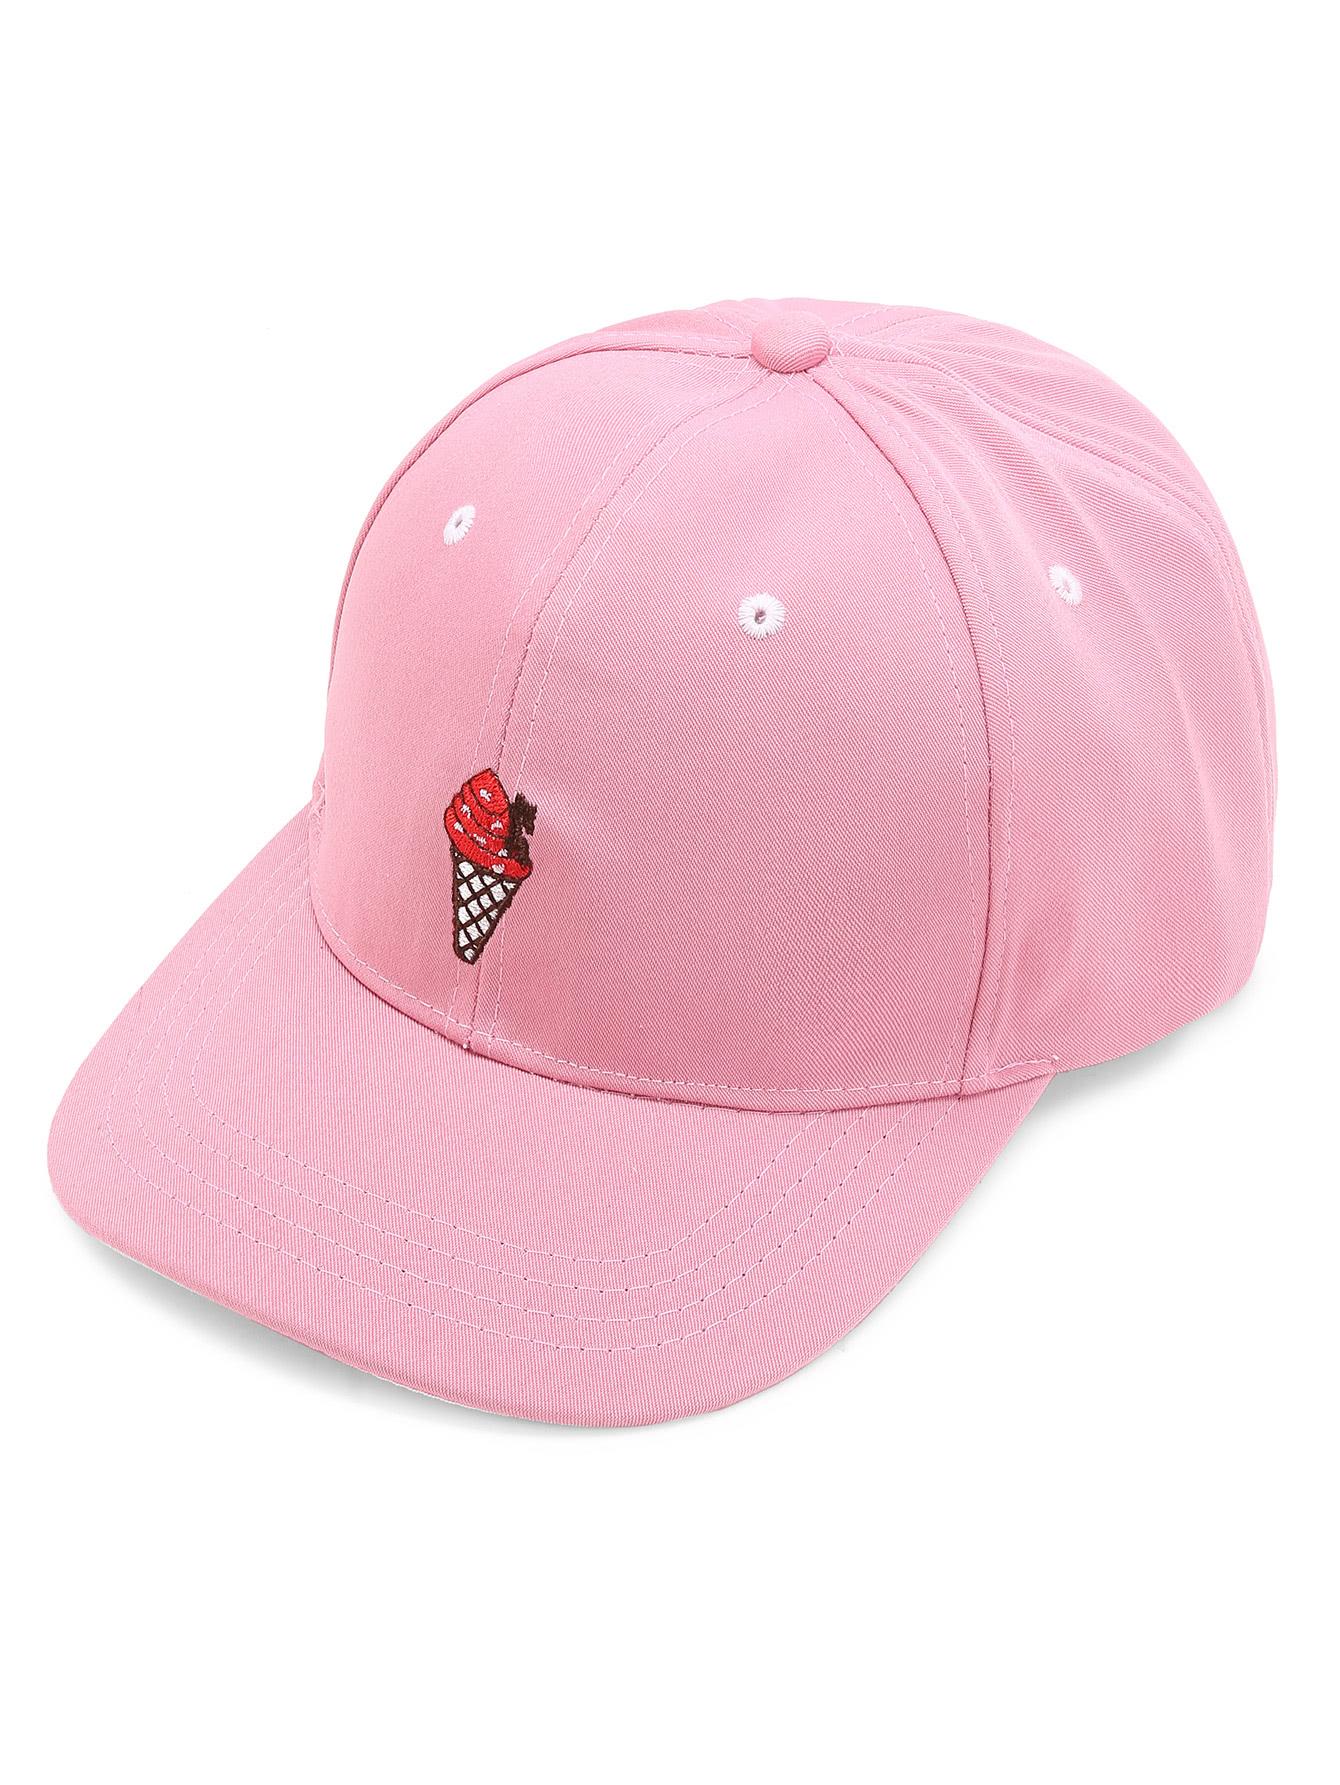 Ice Cream Embroidery Baseball Cap